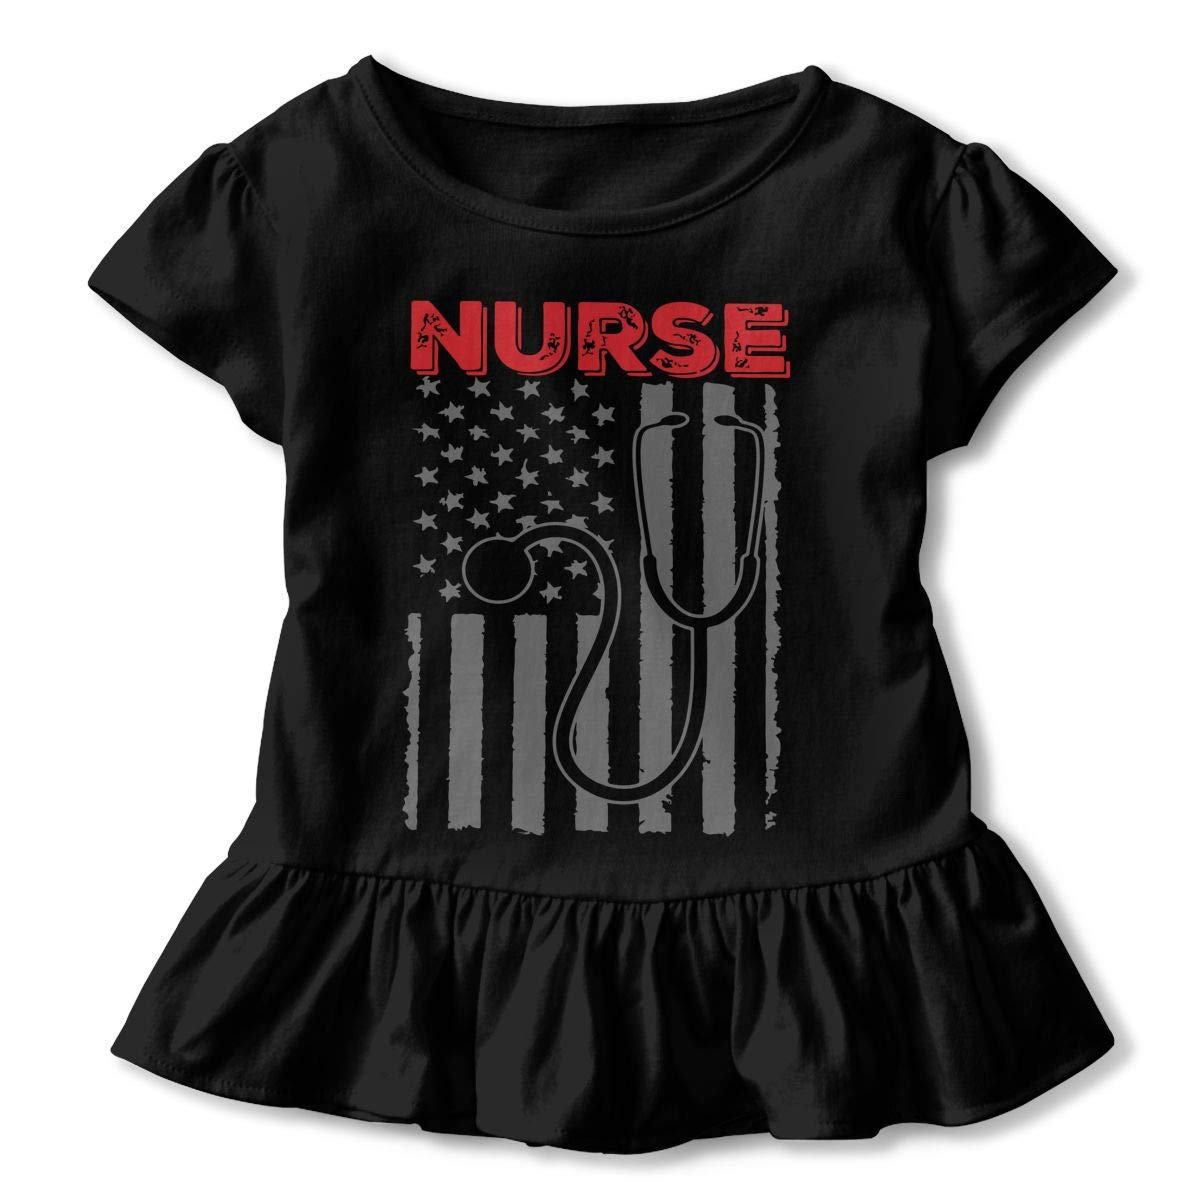 America Flag with Nurse Kids Girls Short Sleeve T-Shirt Ruffles Shirt Tee Jersey for 2-6T